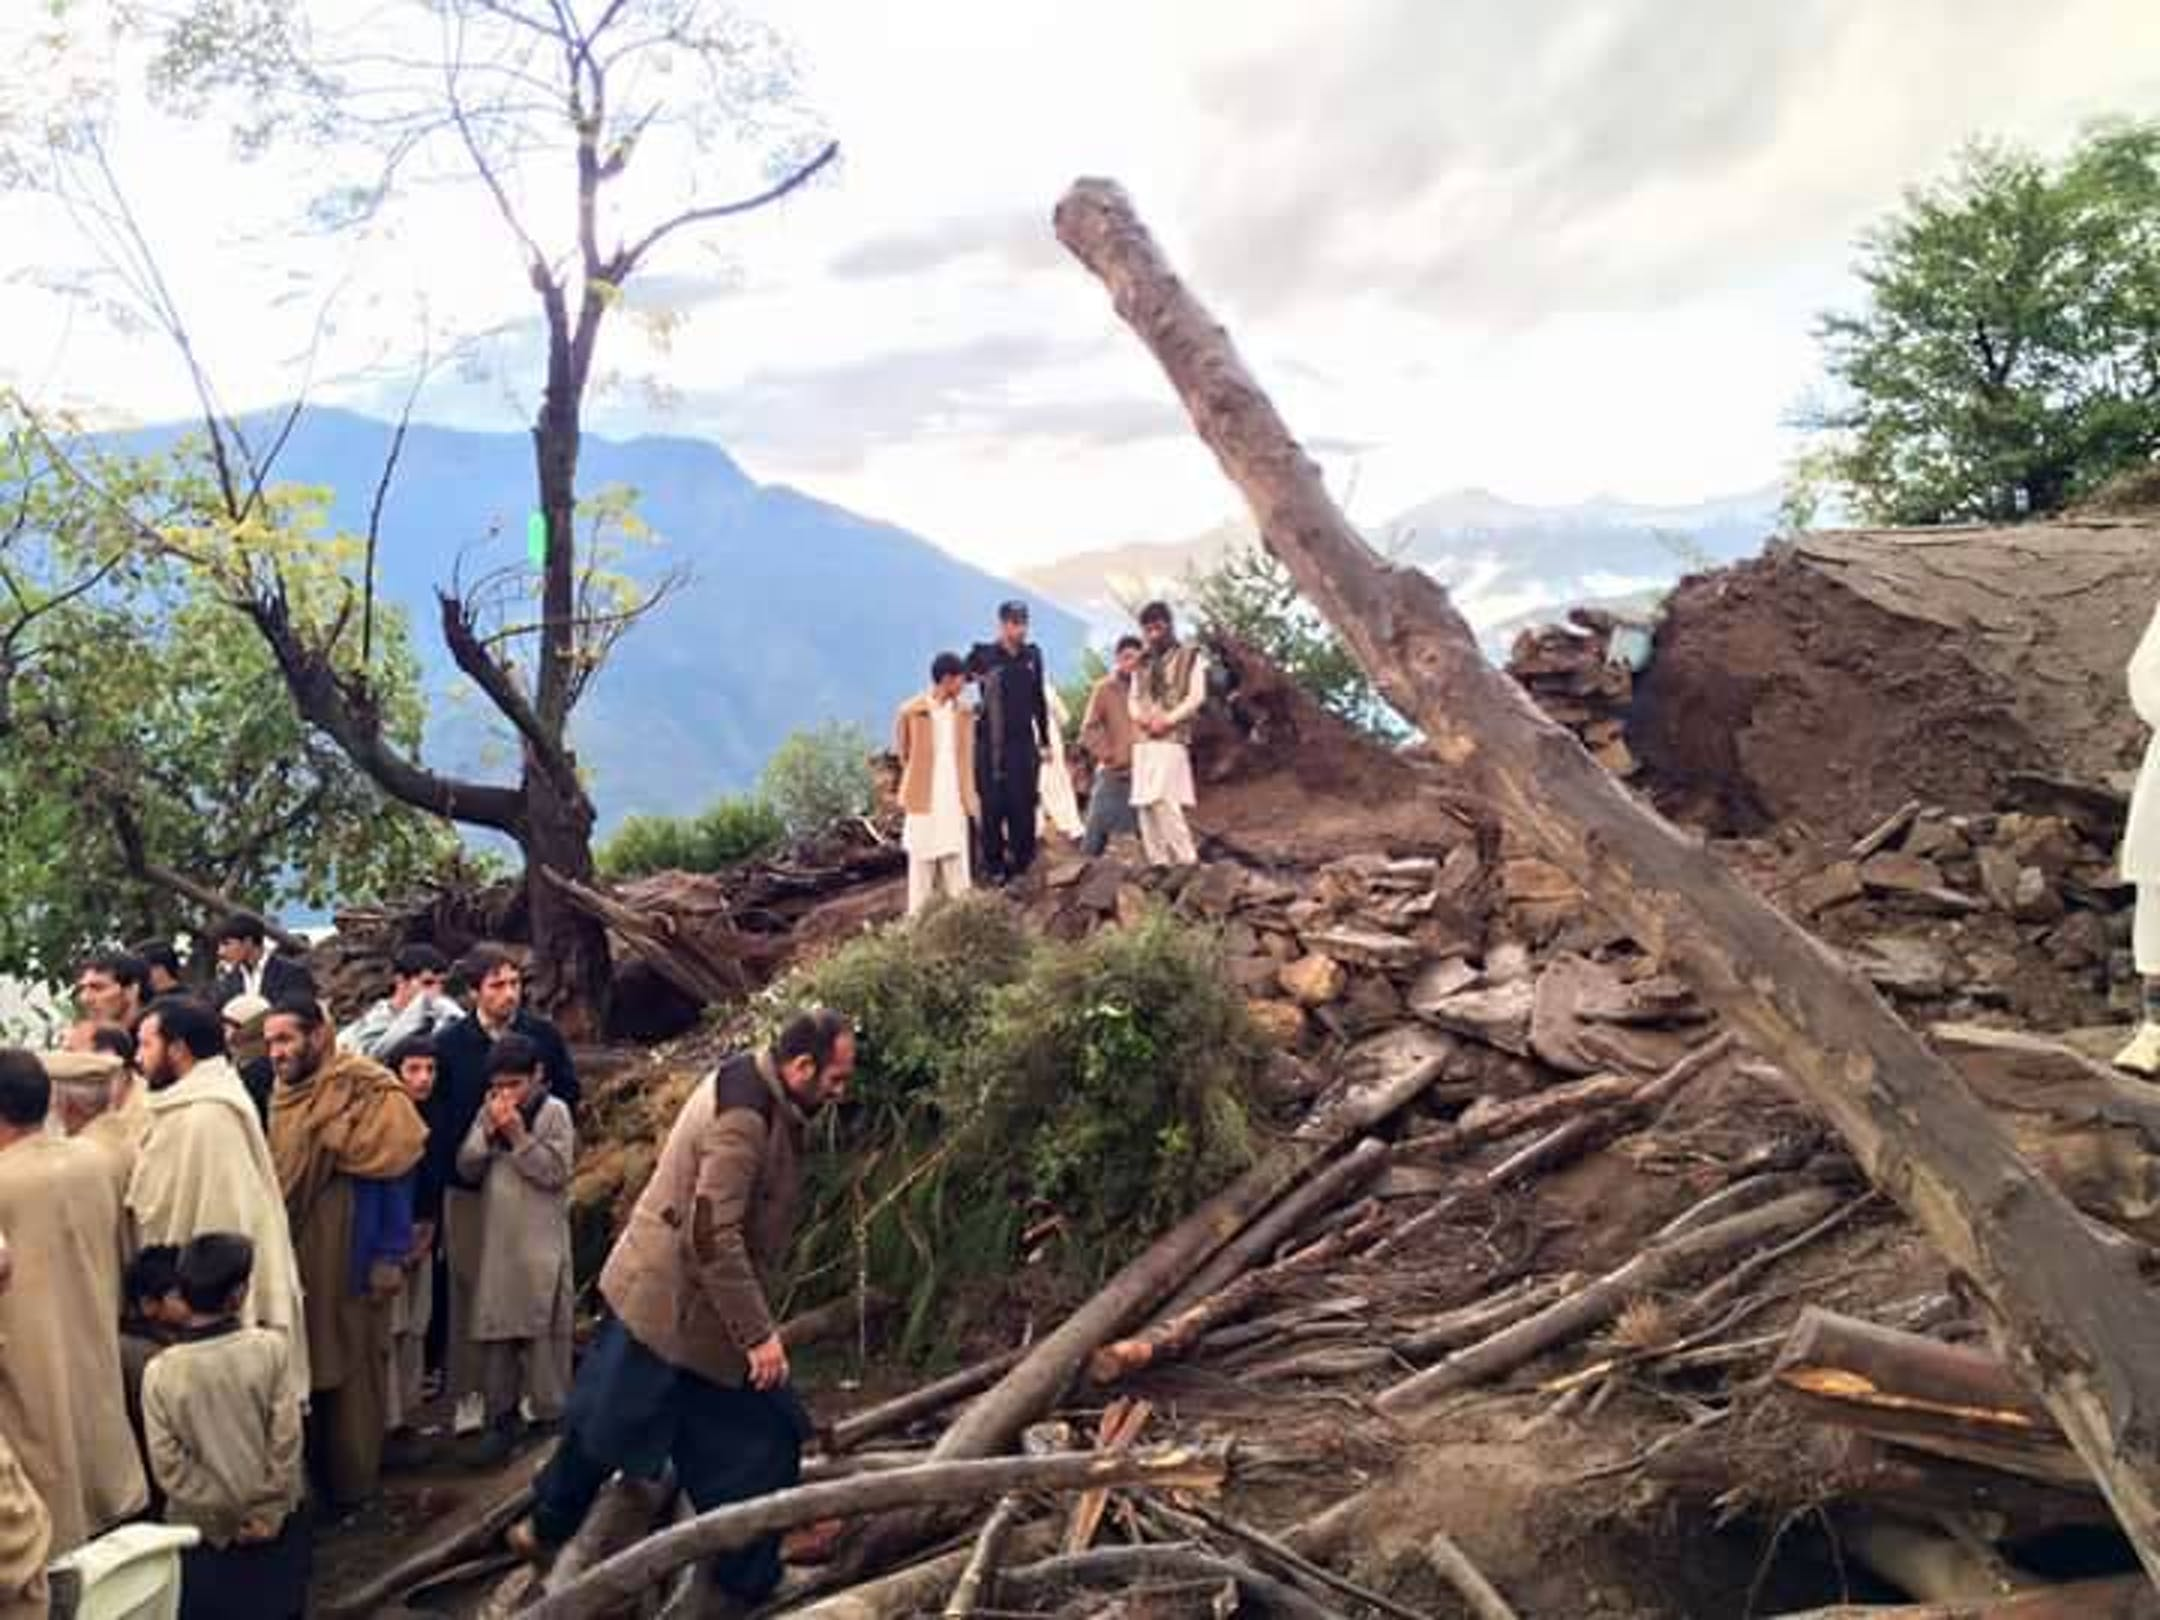 Una scena del dopo terremoto a Shangla, Pakistan - ©UNICEF Pakistan